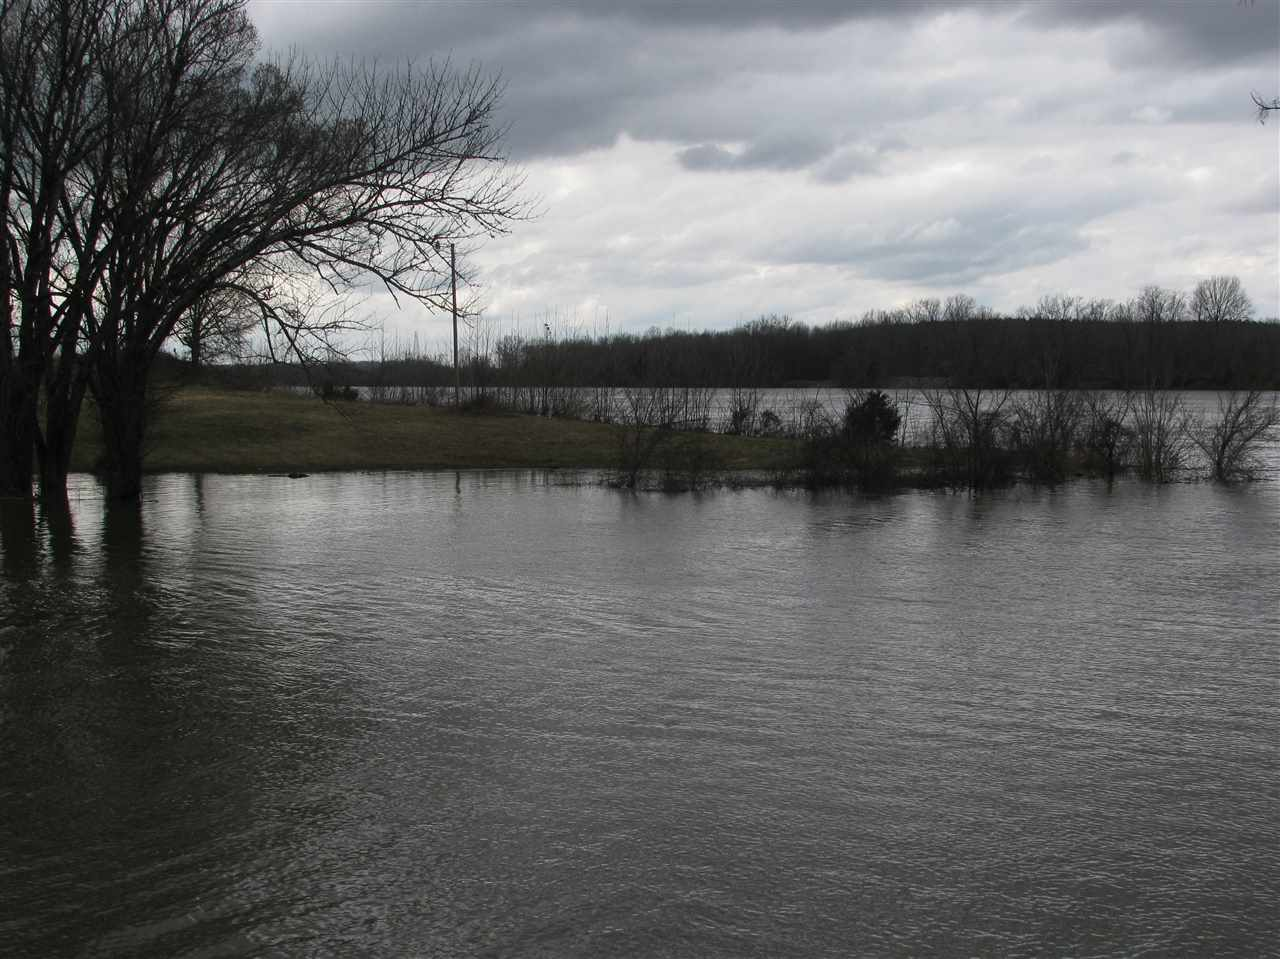 5 Water Clifton, TN 38425 - MLS #: 10021188